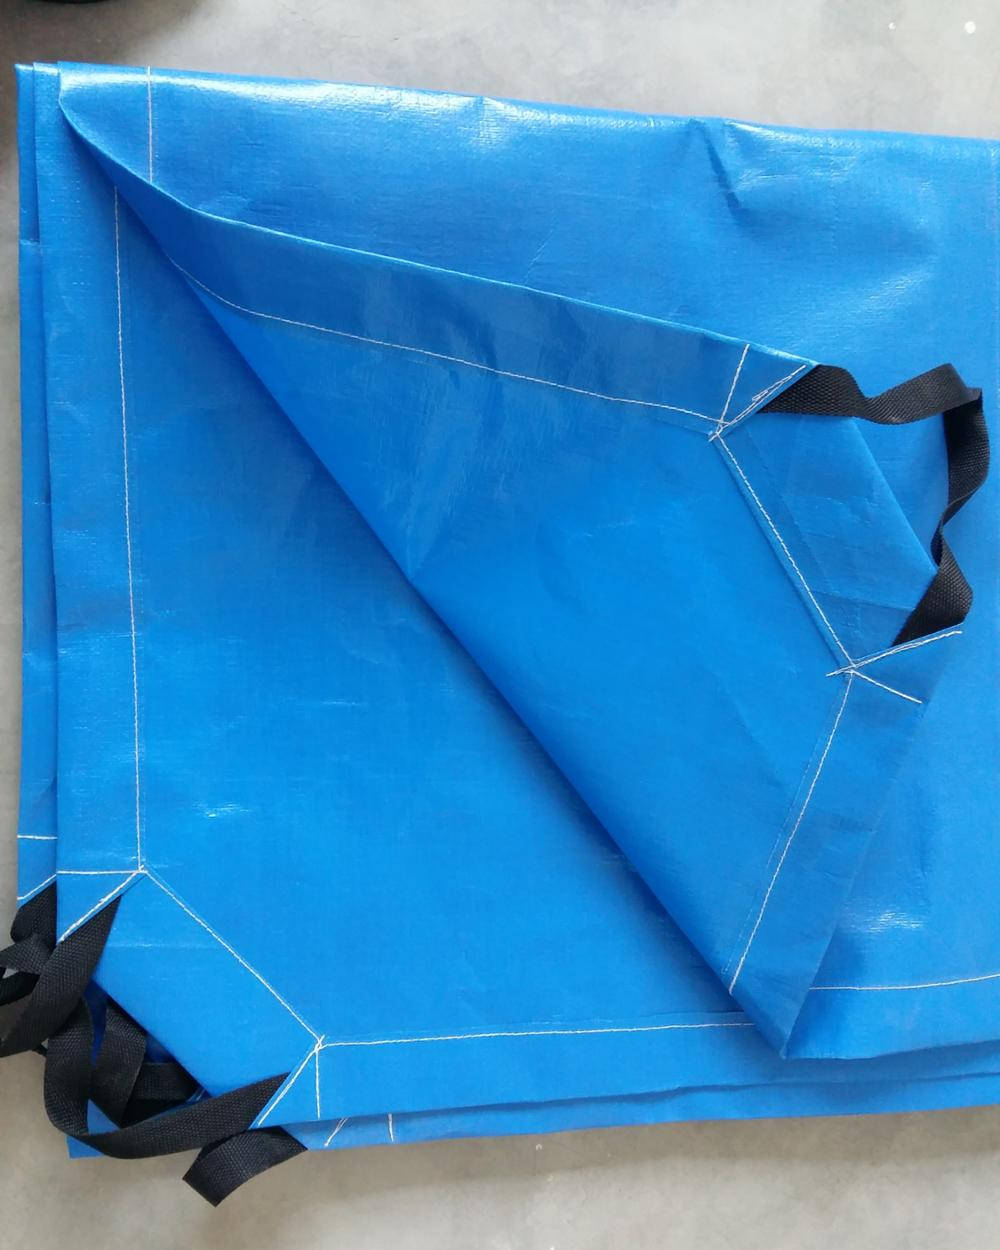 New Heavy Duty Tarpaulin Blue Waterproof Strong Cover Ground Sheet Tarp 5 sizes